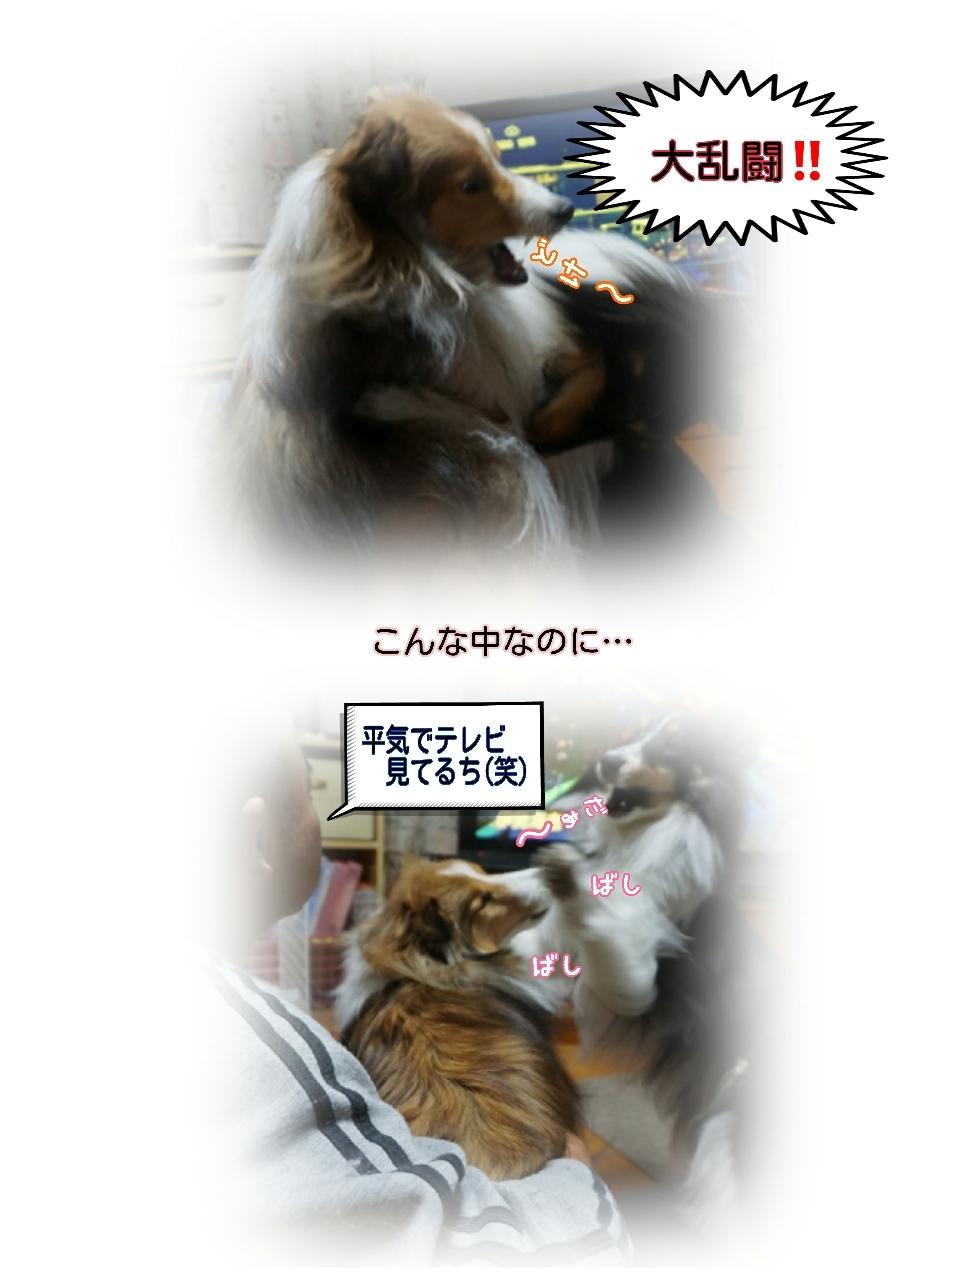 16-11-23-10-24-47-378_deco.jpg